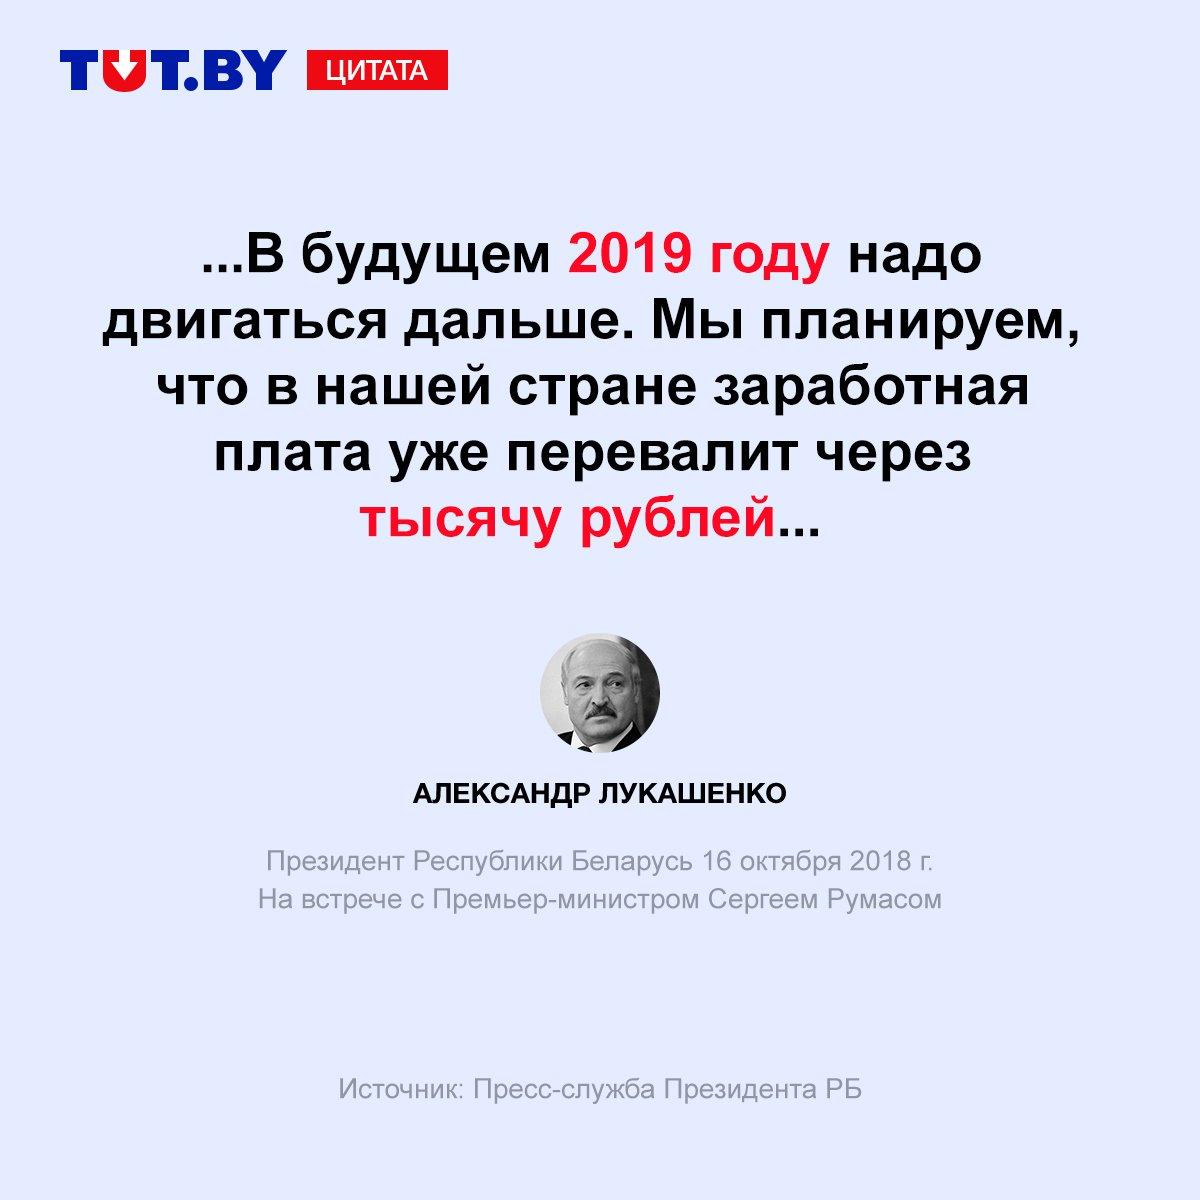 RT @tutby: Ноу комментс  #2009vs2019 https://t.co/64dCmMOdHS